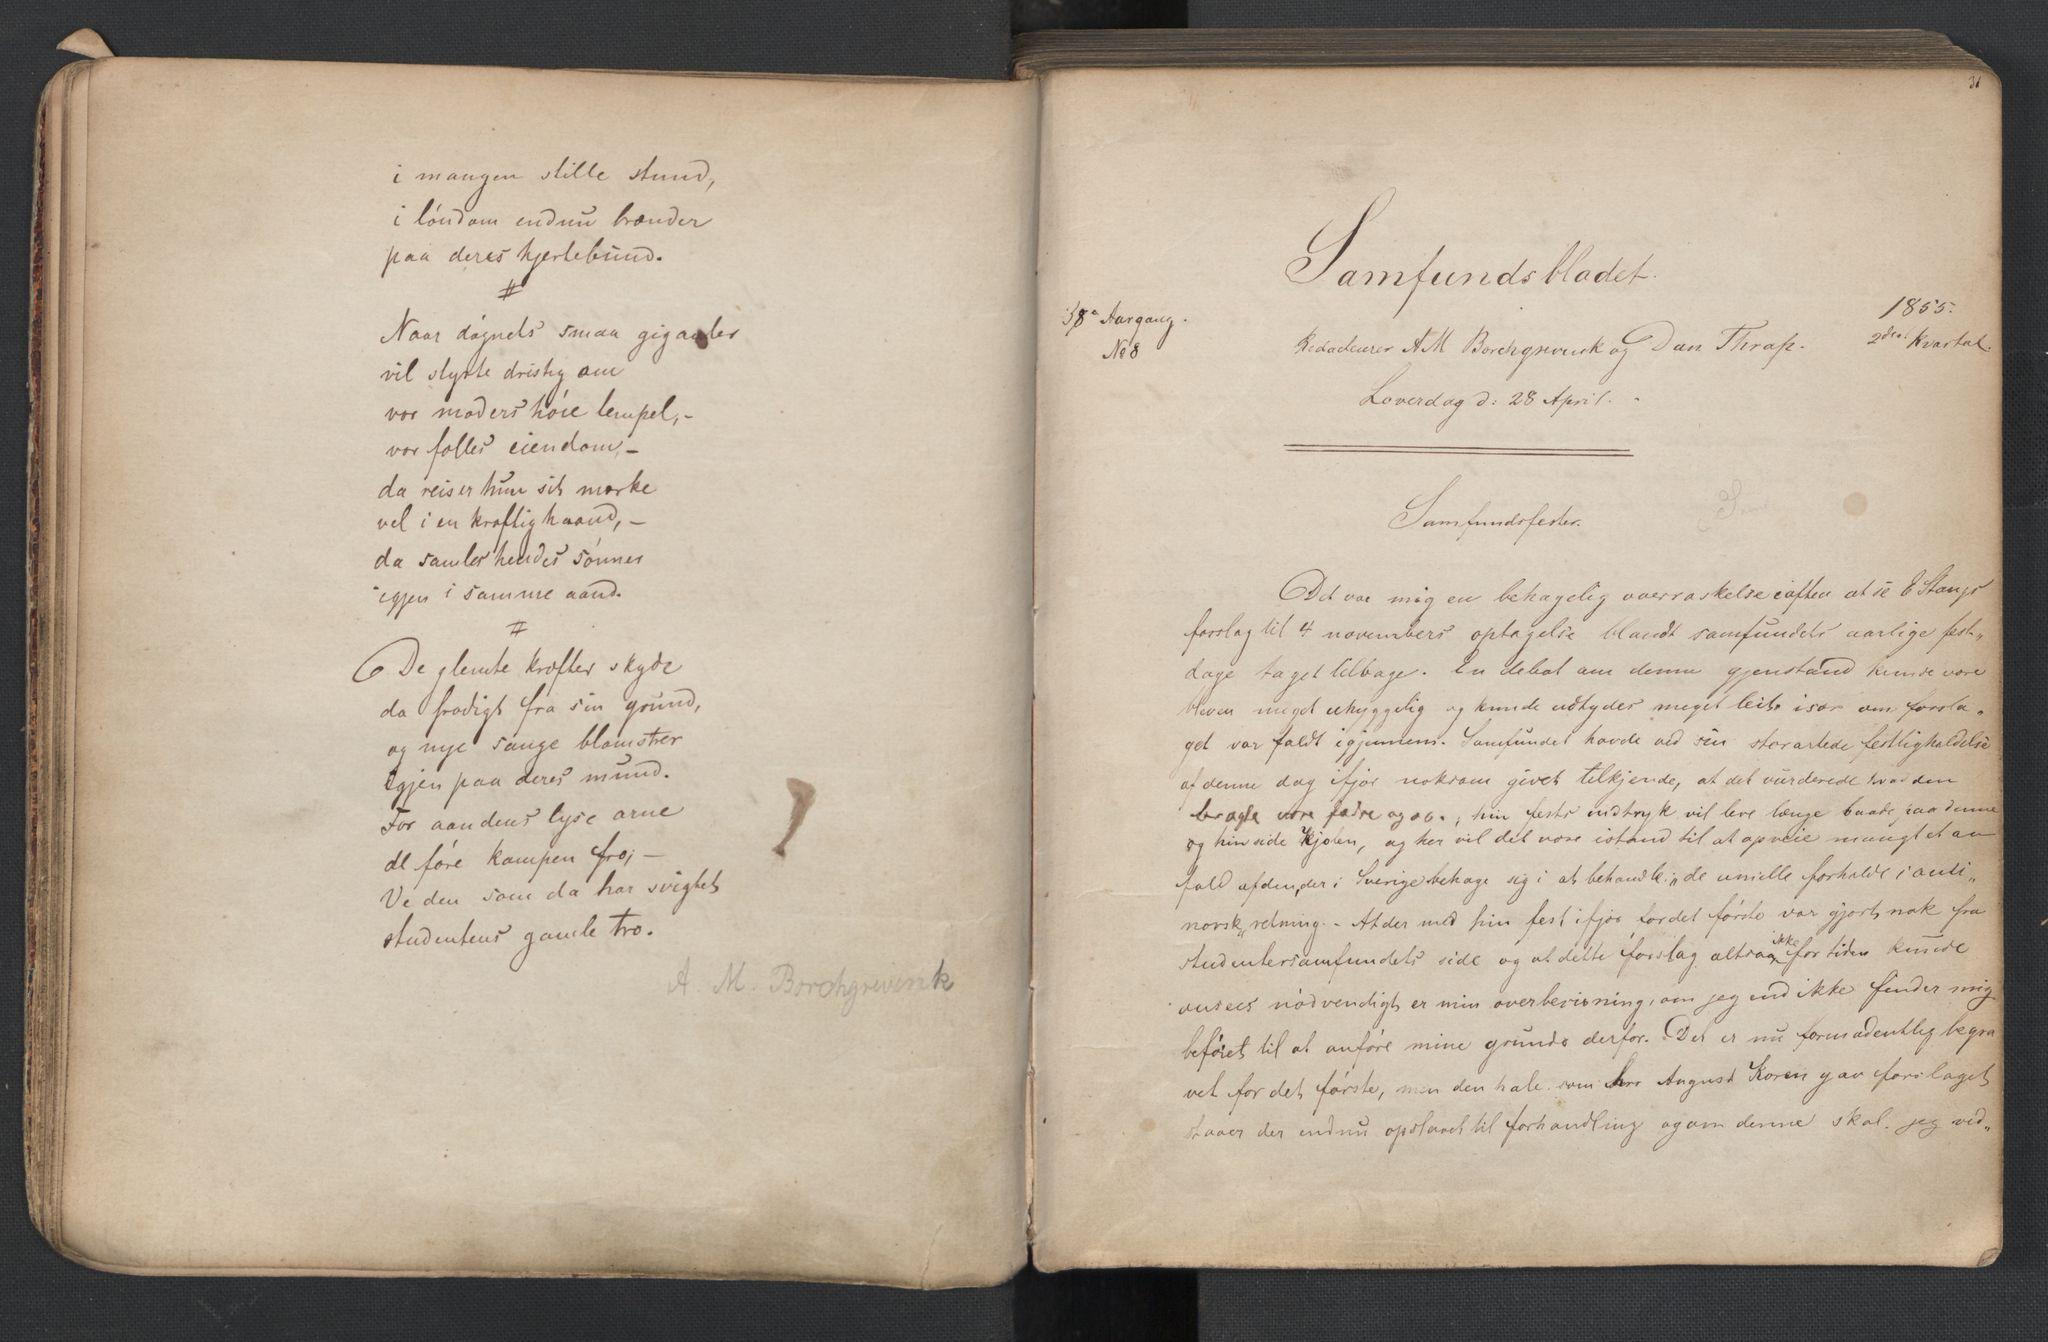 RA, Det Norske Studentersamfund, X/Xa/L0005, 1855-1856, s. 17